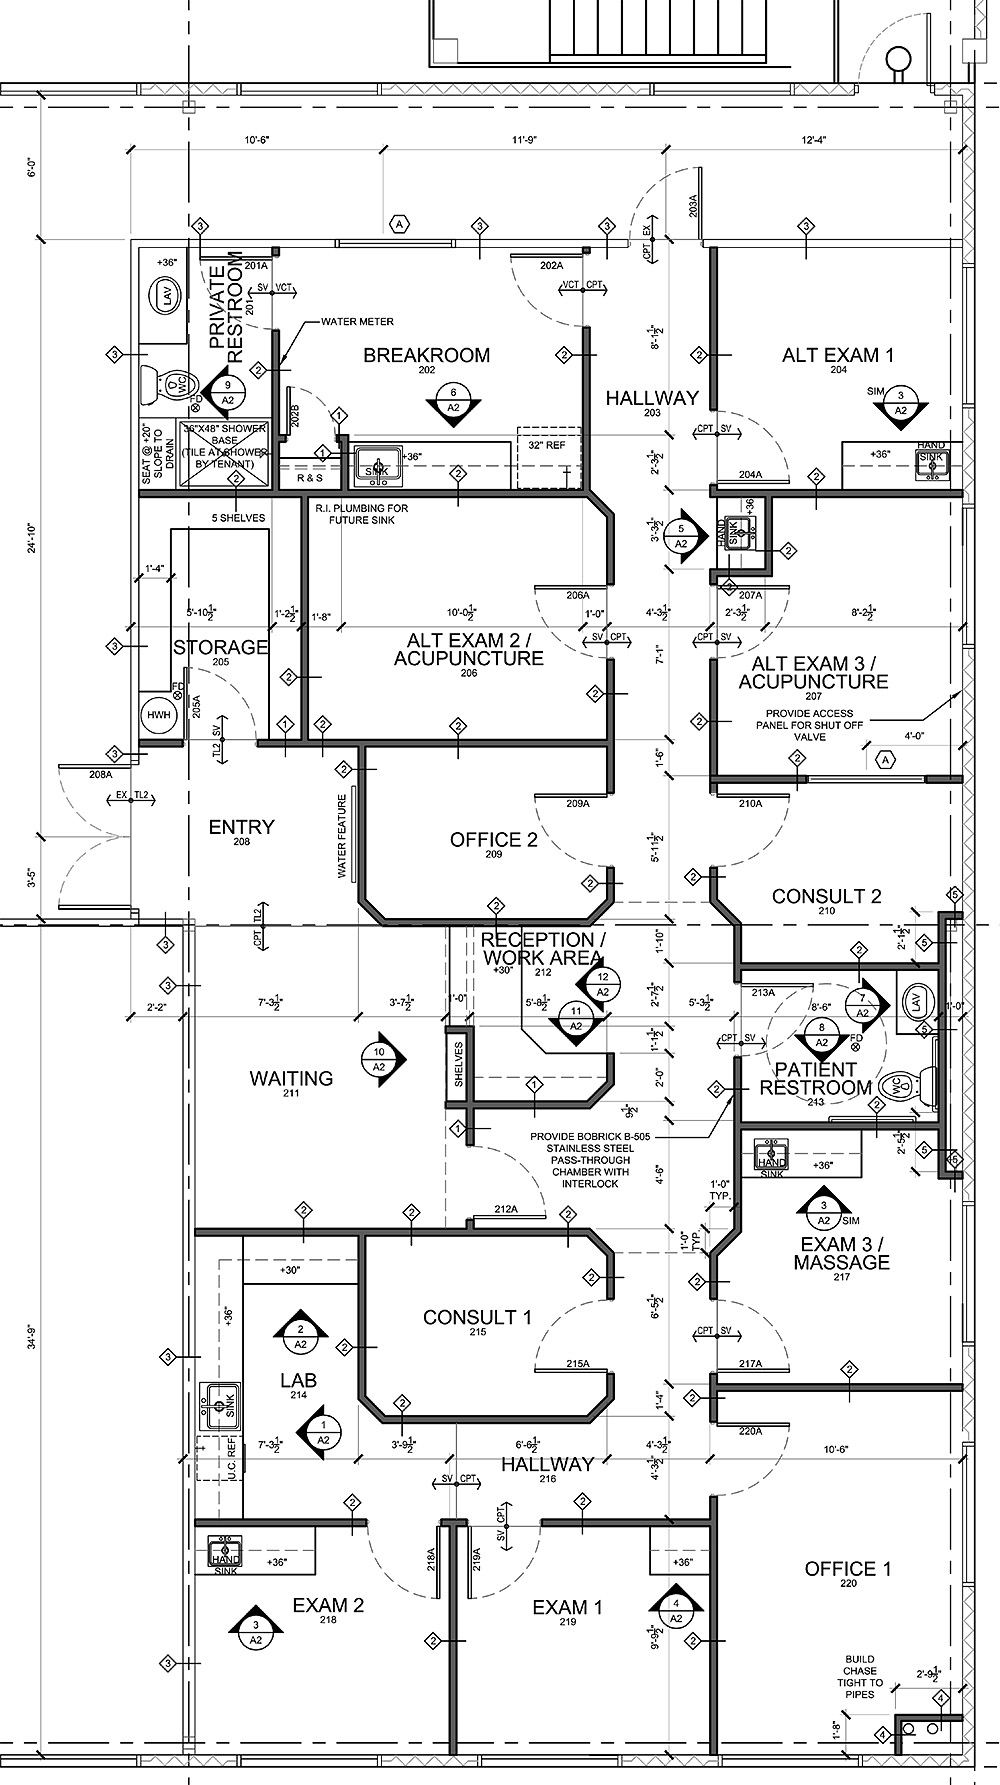 Advice For Medical Office Floor Plan Design In Tenant Buildings Evstudio